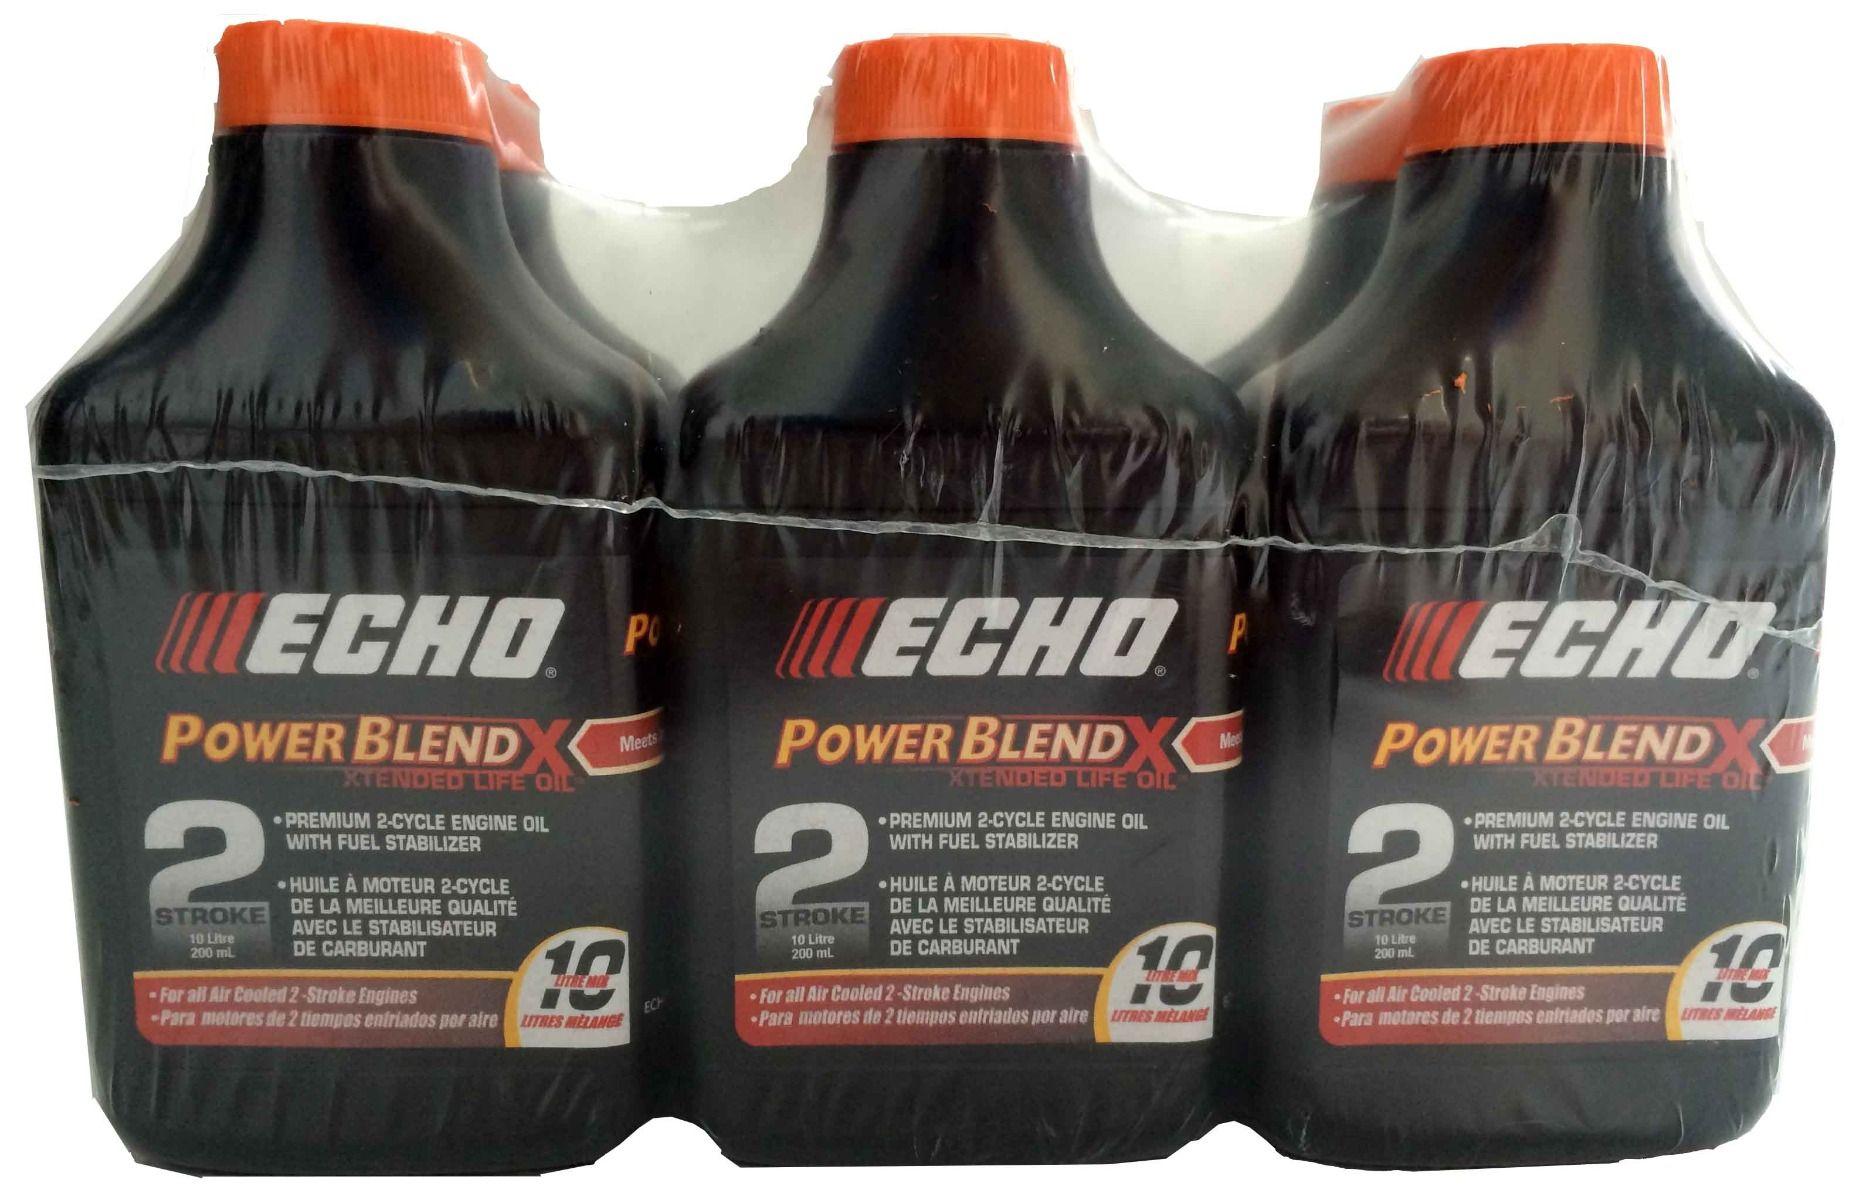 ECHO POWERBLEND PREMIUM 2 CYCLE ENGINE OIL 200ML bottles